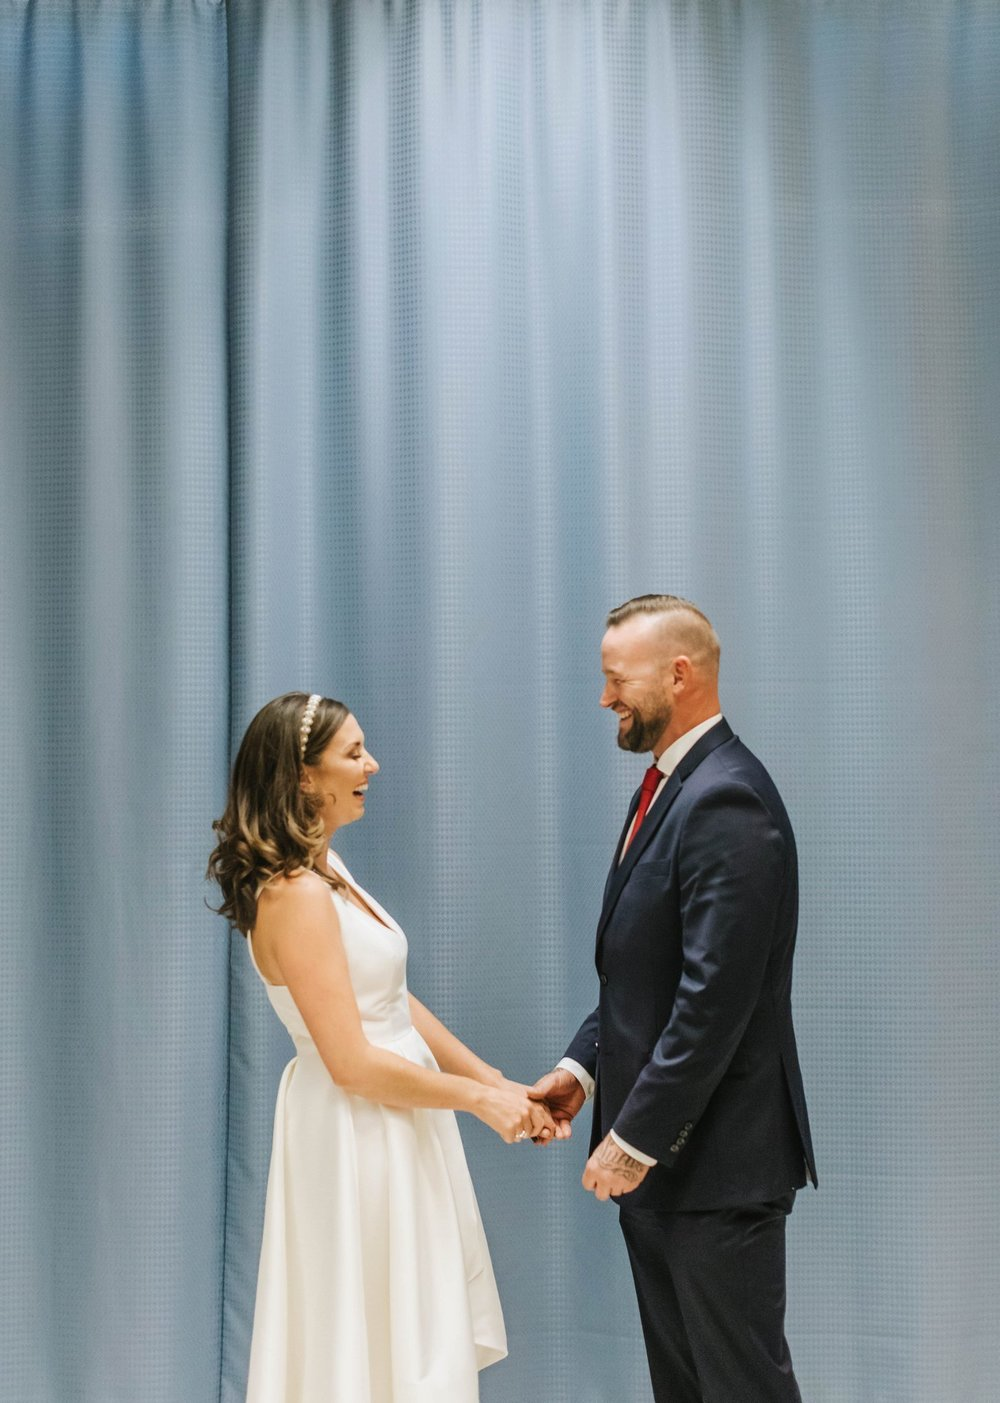 Boston-City-Hall-Wedding-Elopement-Photographer-Lena-Mirisola-2.JPG